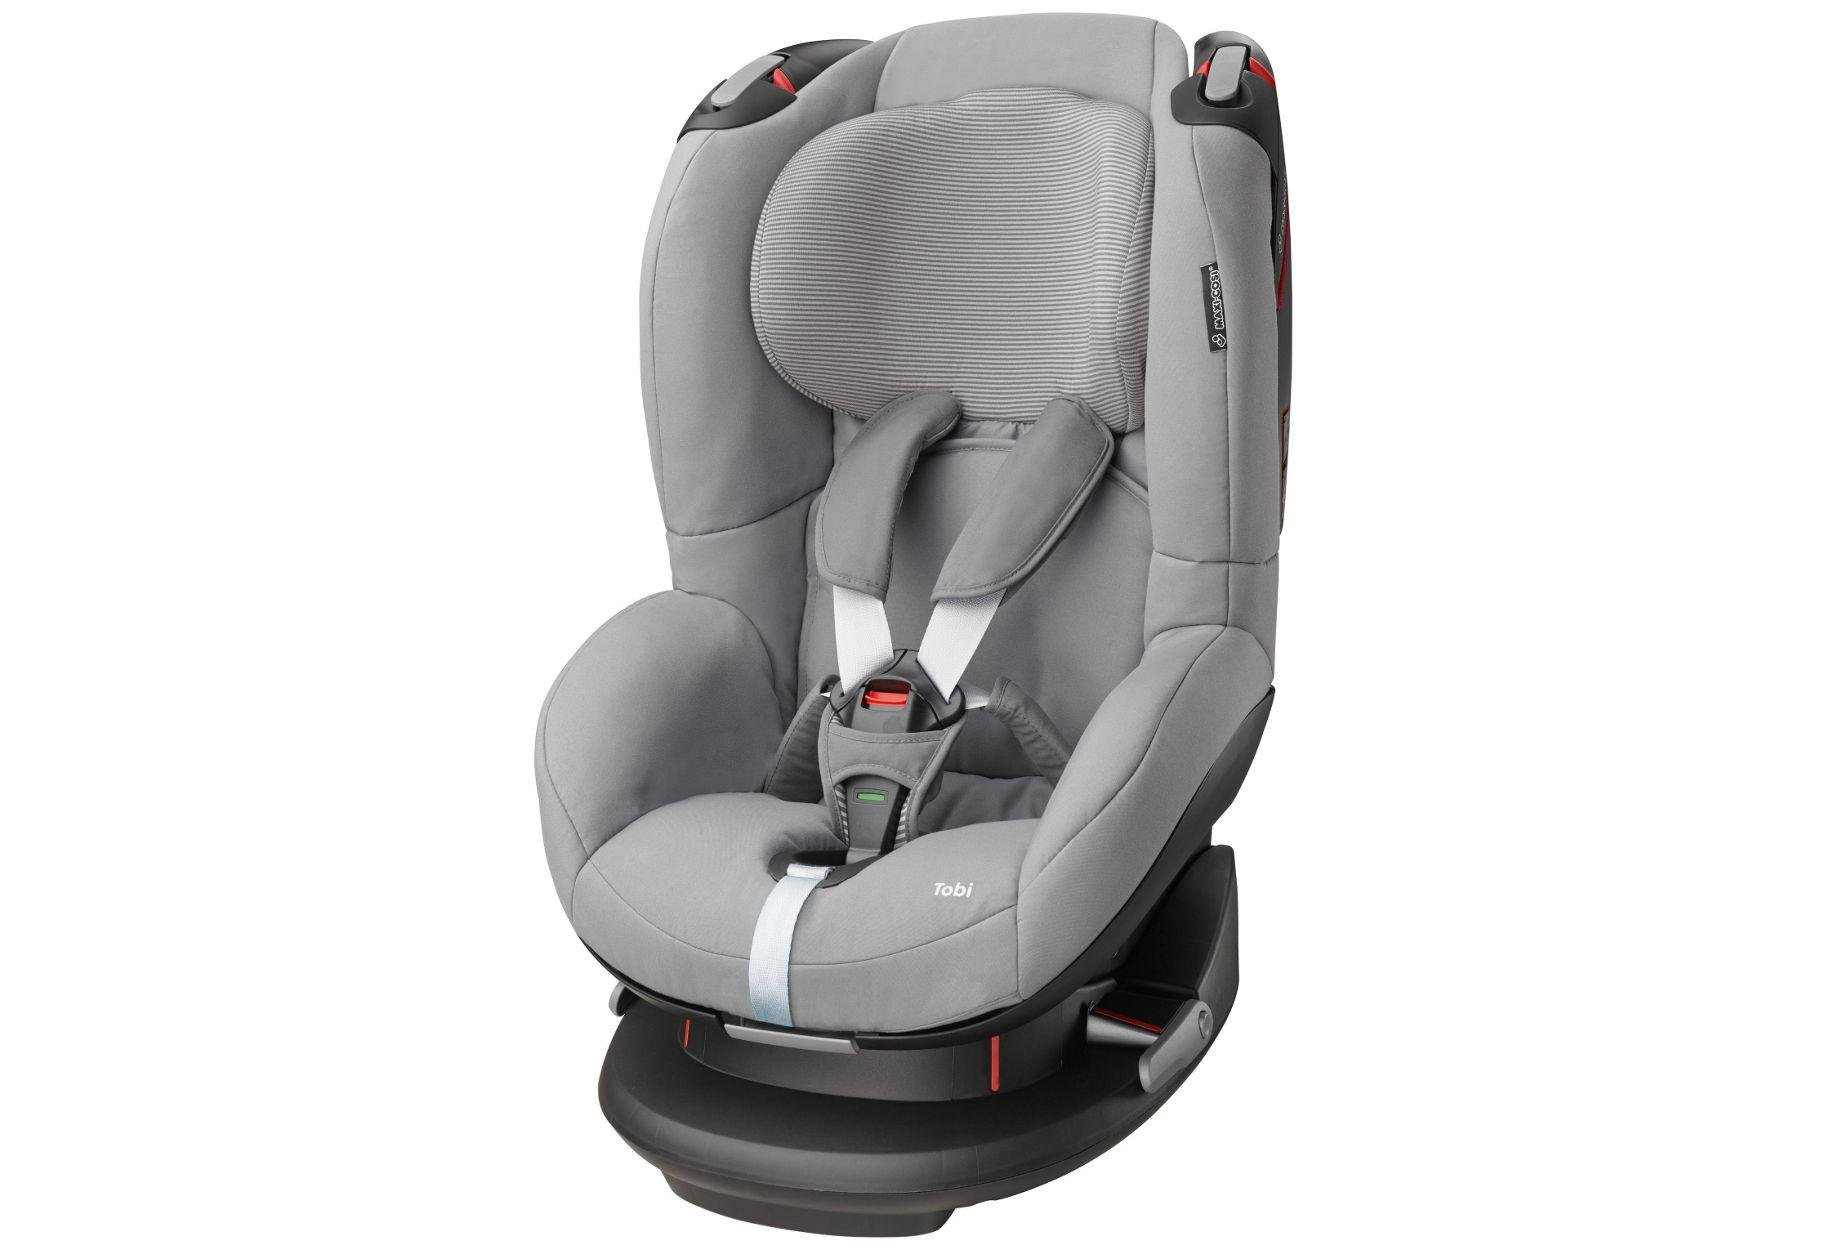 Maxi-Cosi Tobi Group 1 Car Seat - Concrete Grey